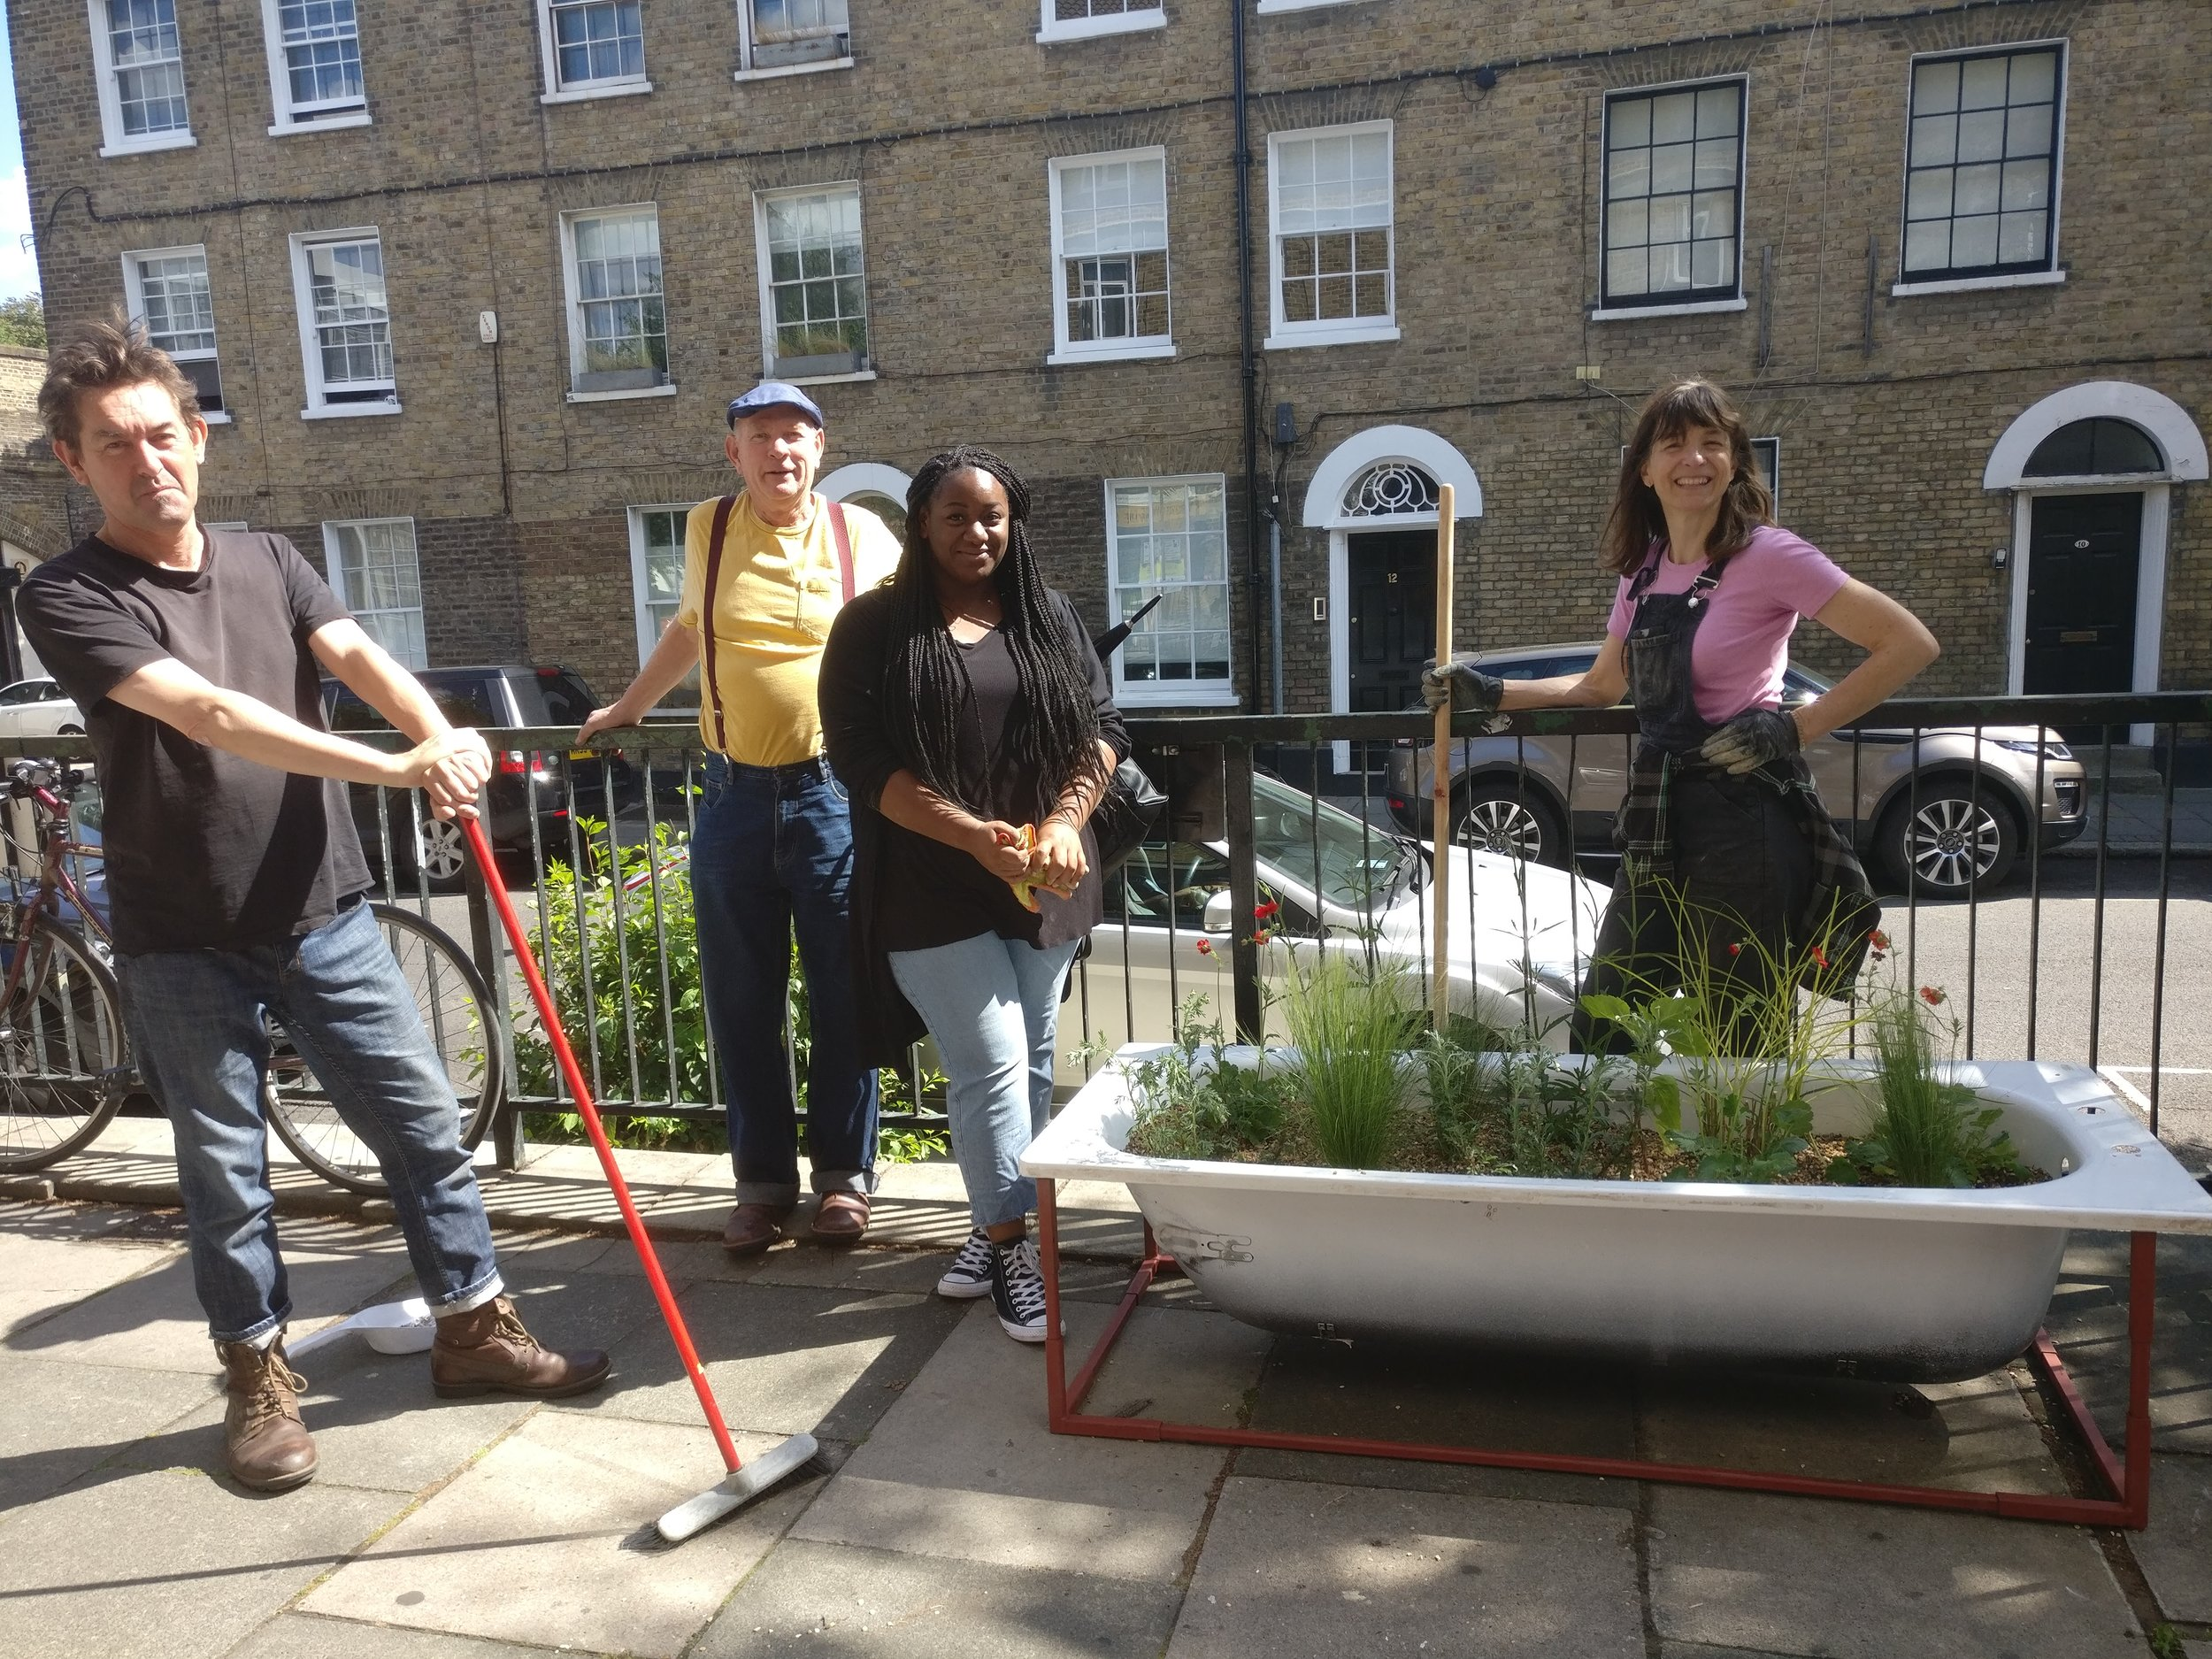 Final bath installed at Hundred Years Gallery with volunteers Graham, Peter, Devinya and chief PEER gardener Jane